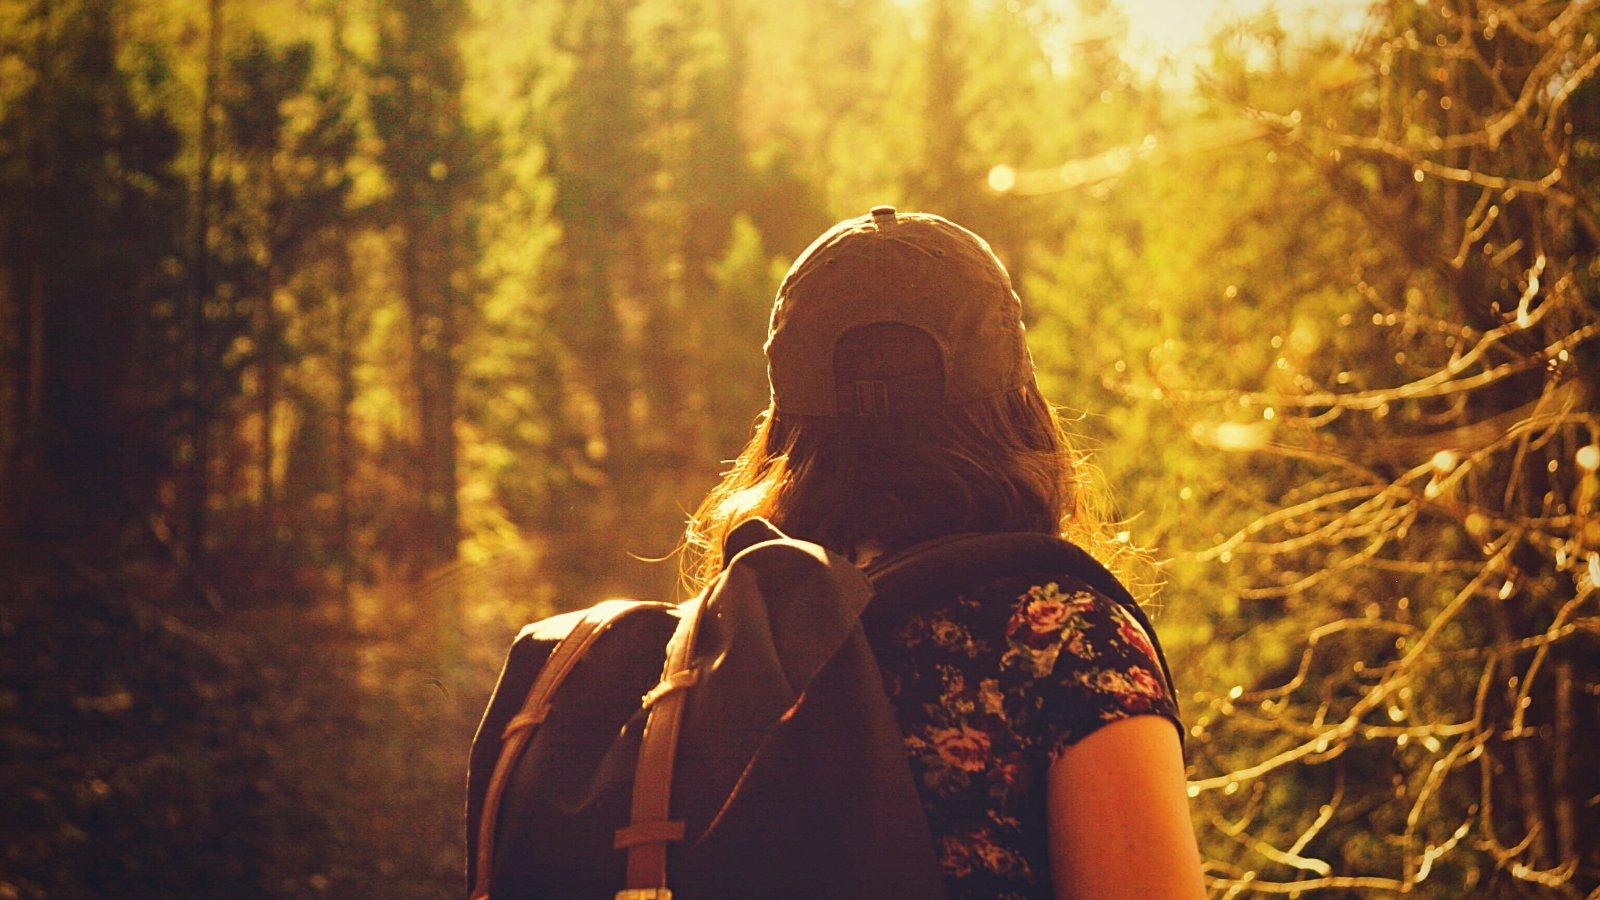 saveti za planinarenje za pocetnike pripremiti se kako uspon kondiciona tezina tehnicka obuca odeca ranac avantura